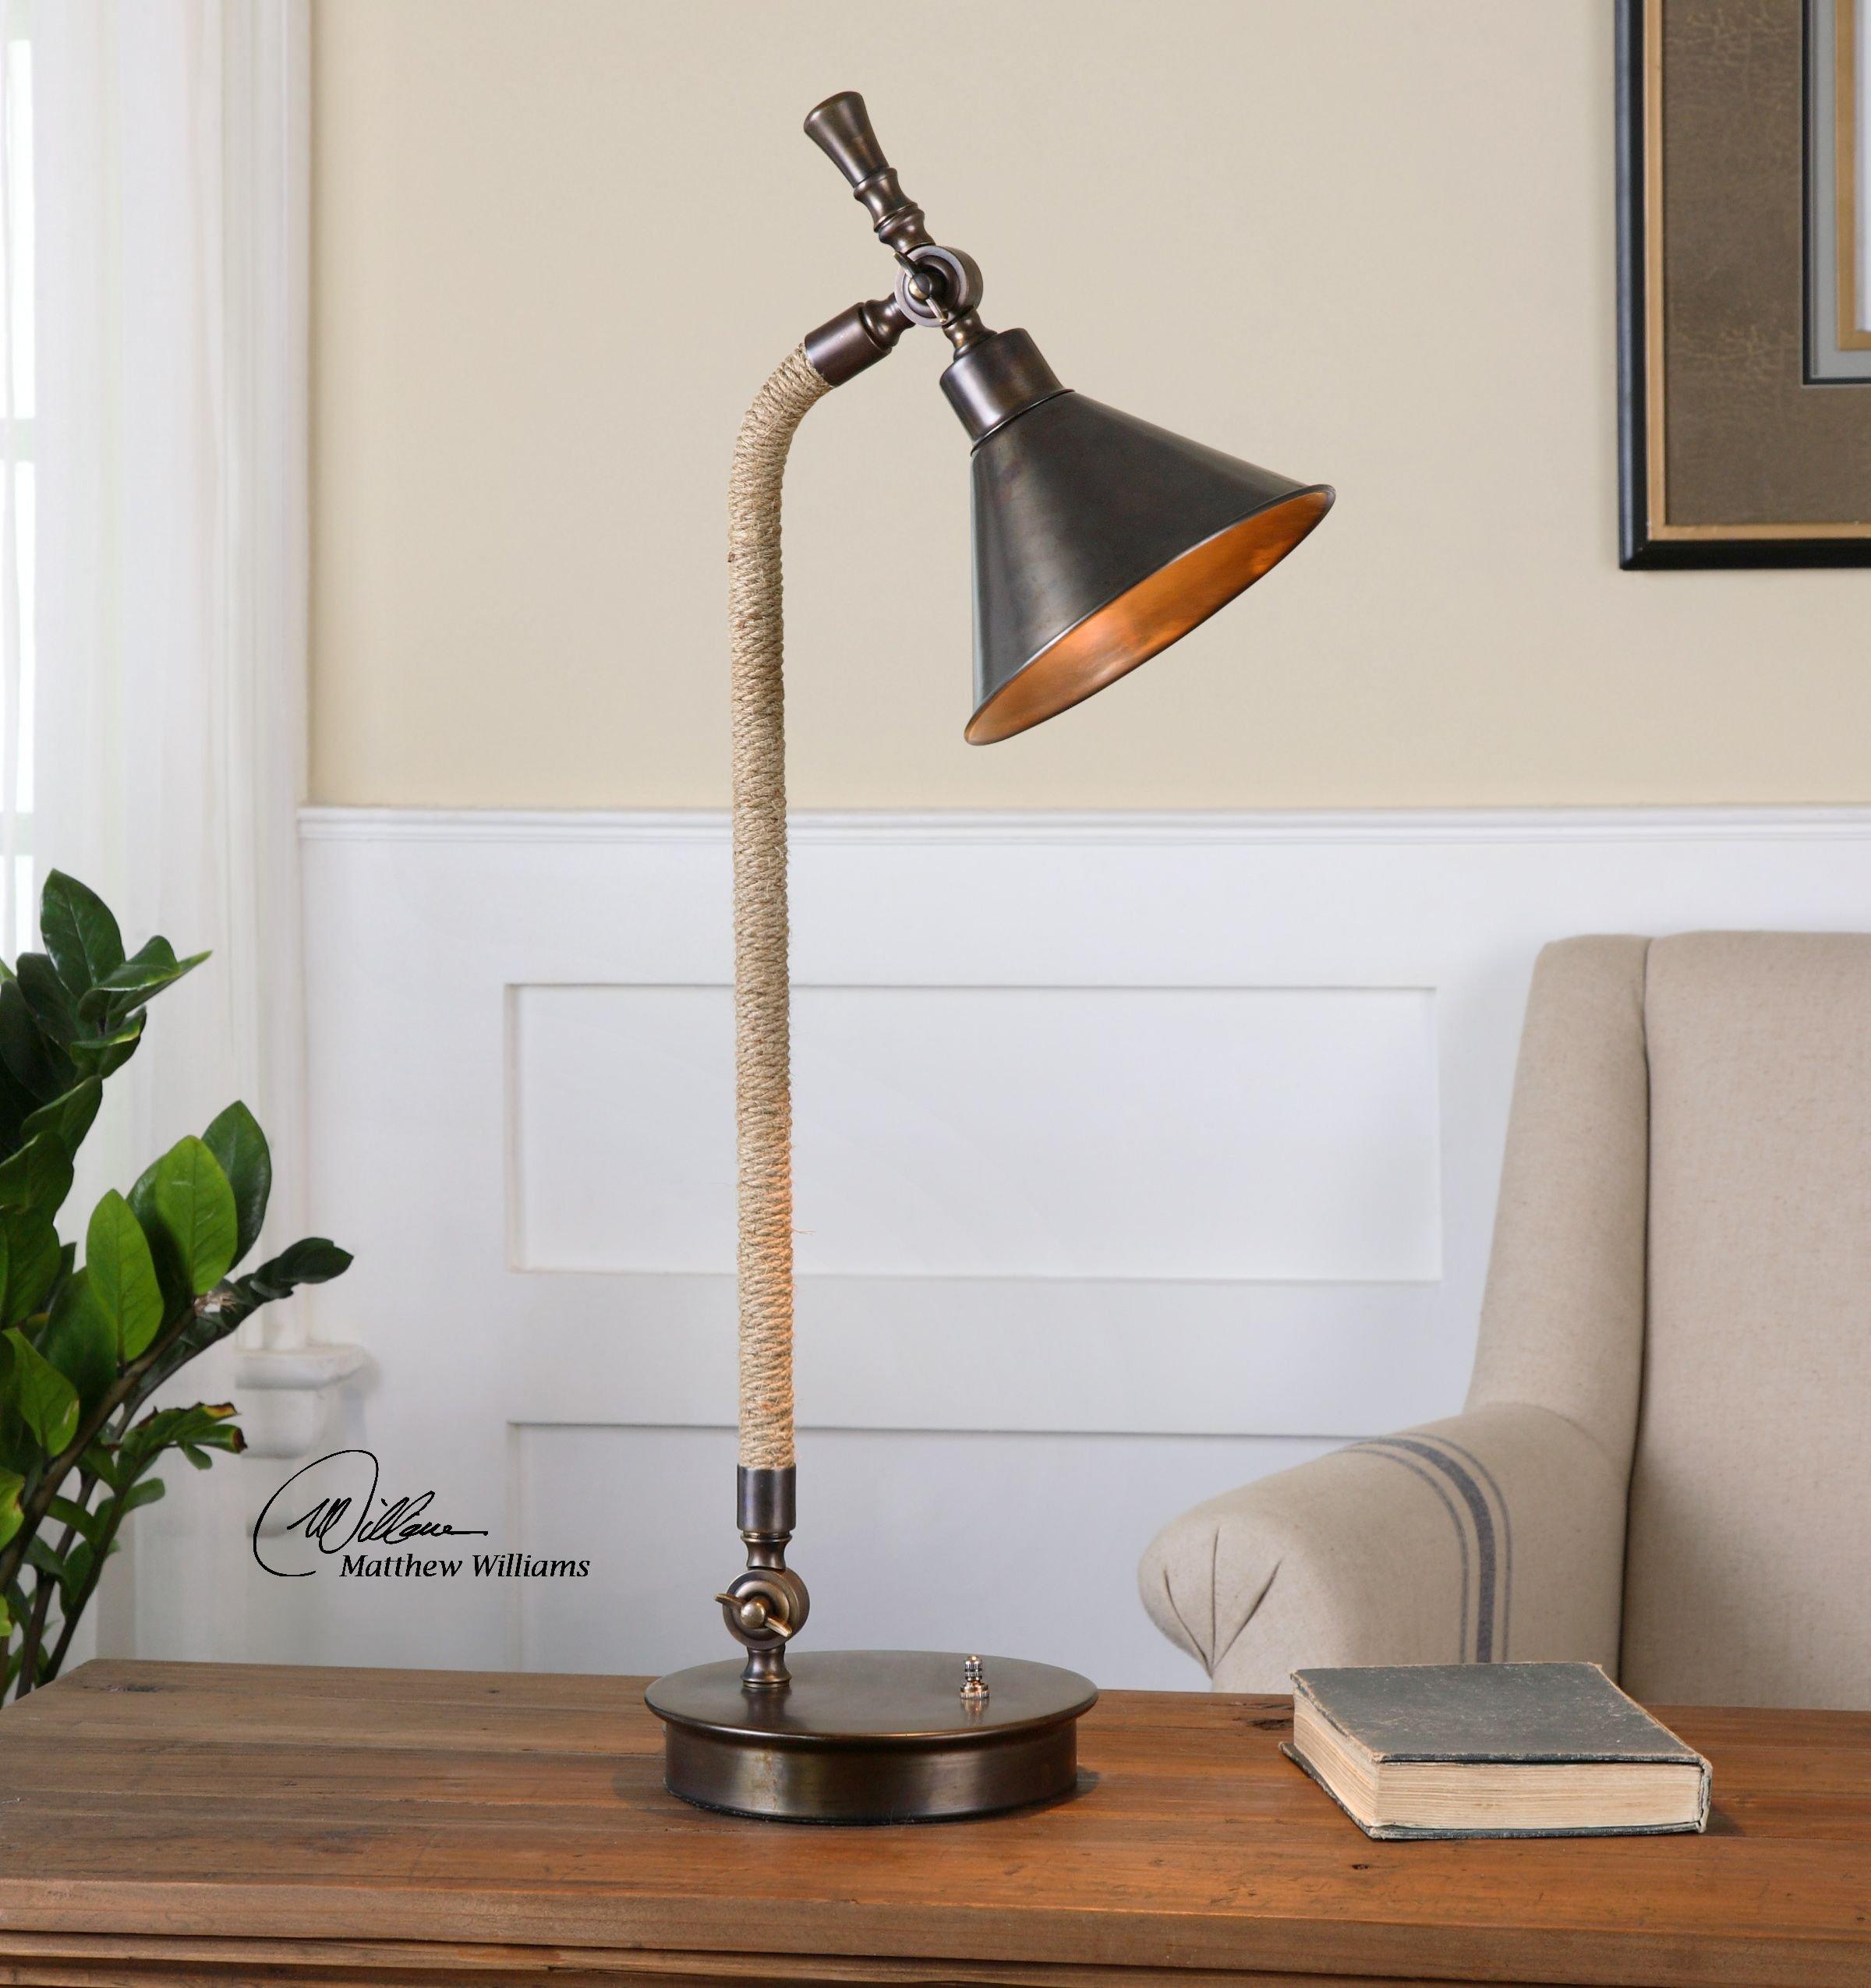 Retro Industrial Bronze Desk Task Lamp | Oxidized Metal Rope by Intelligent Design